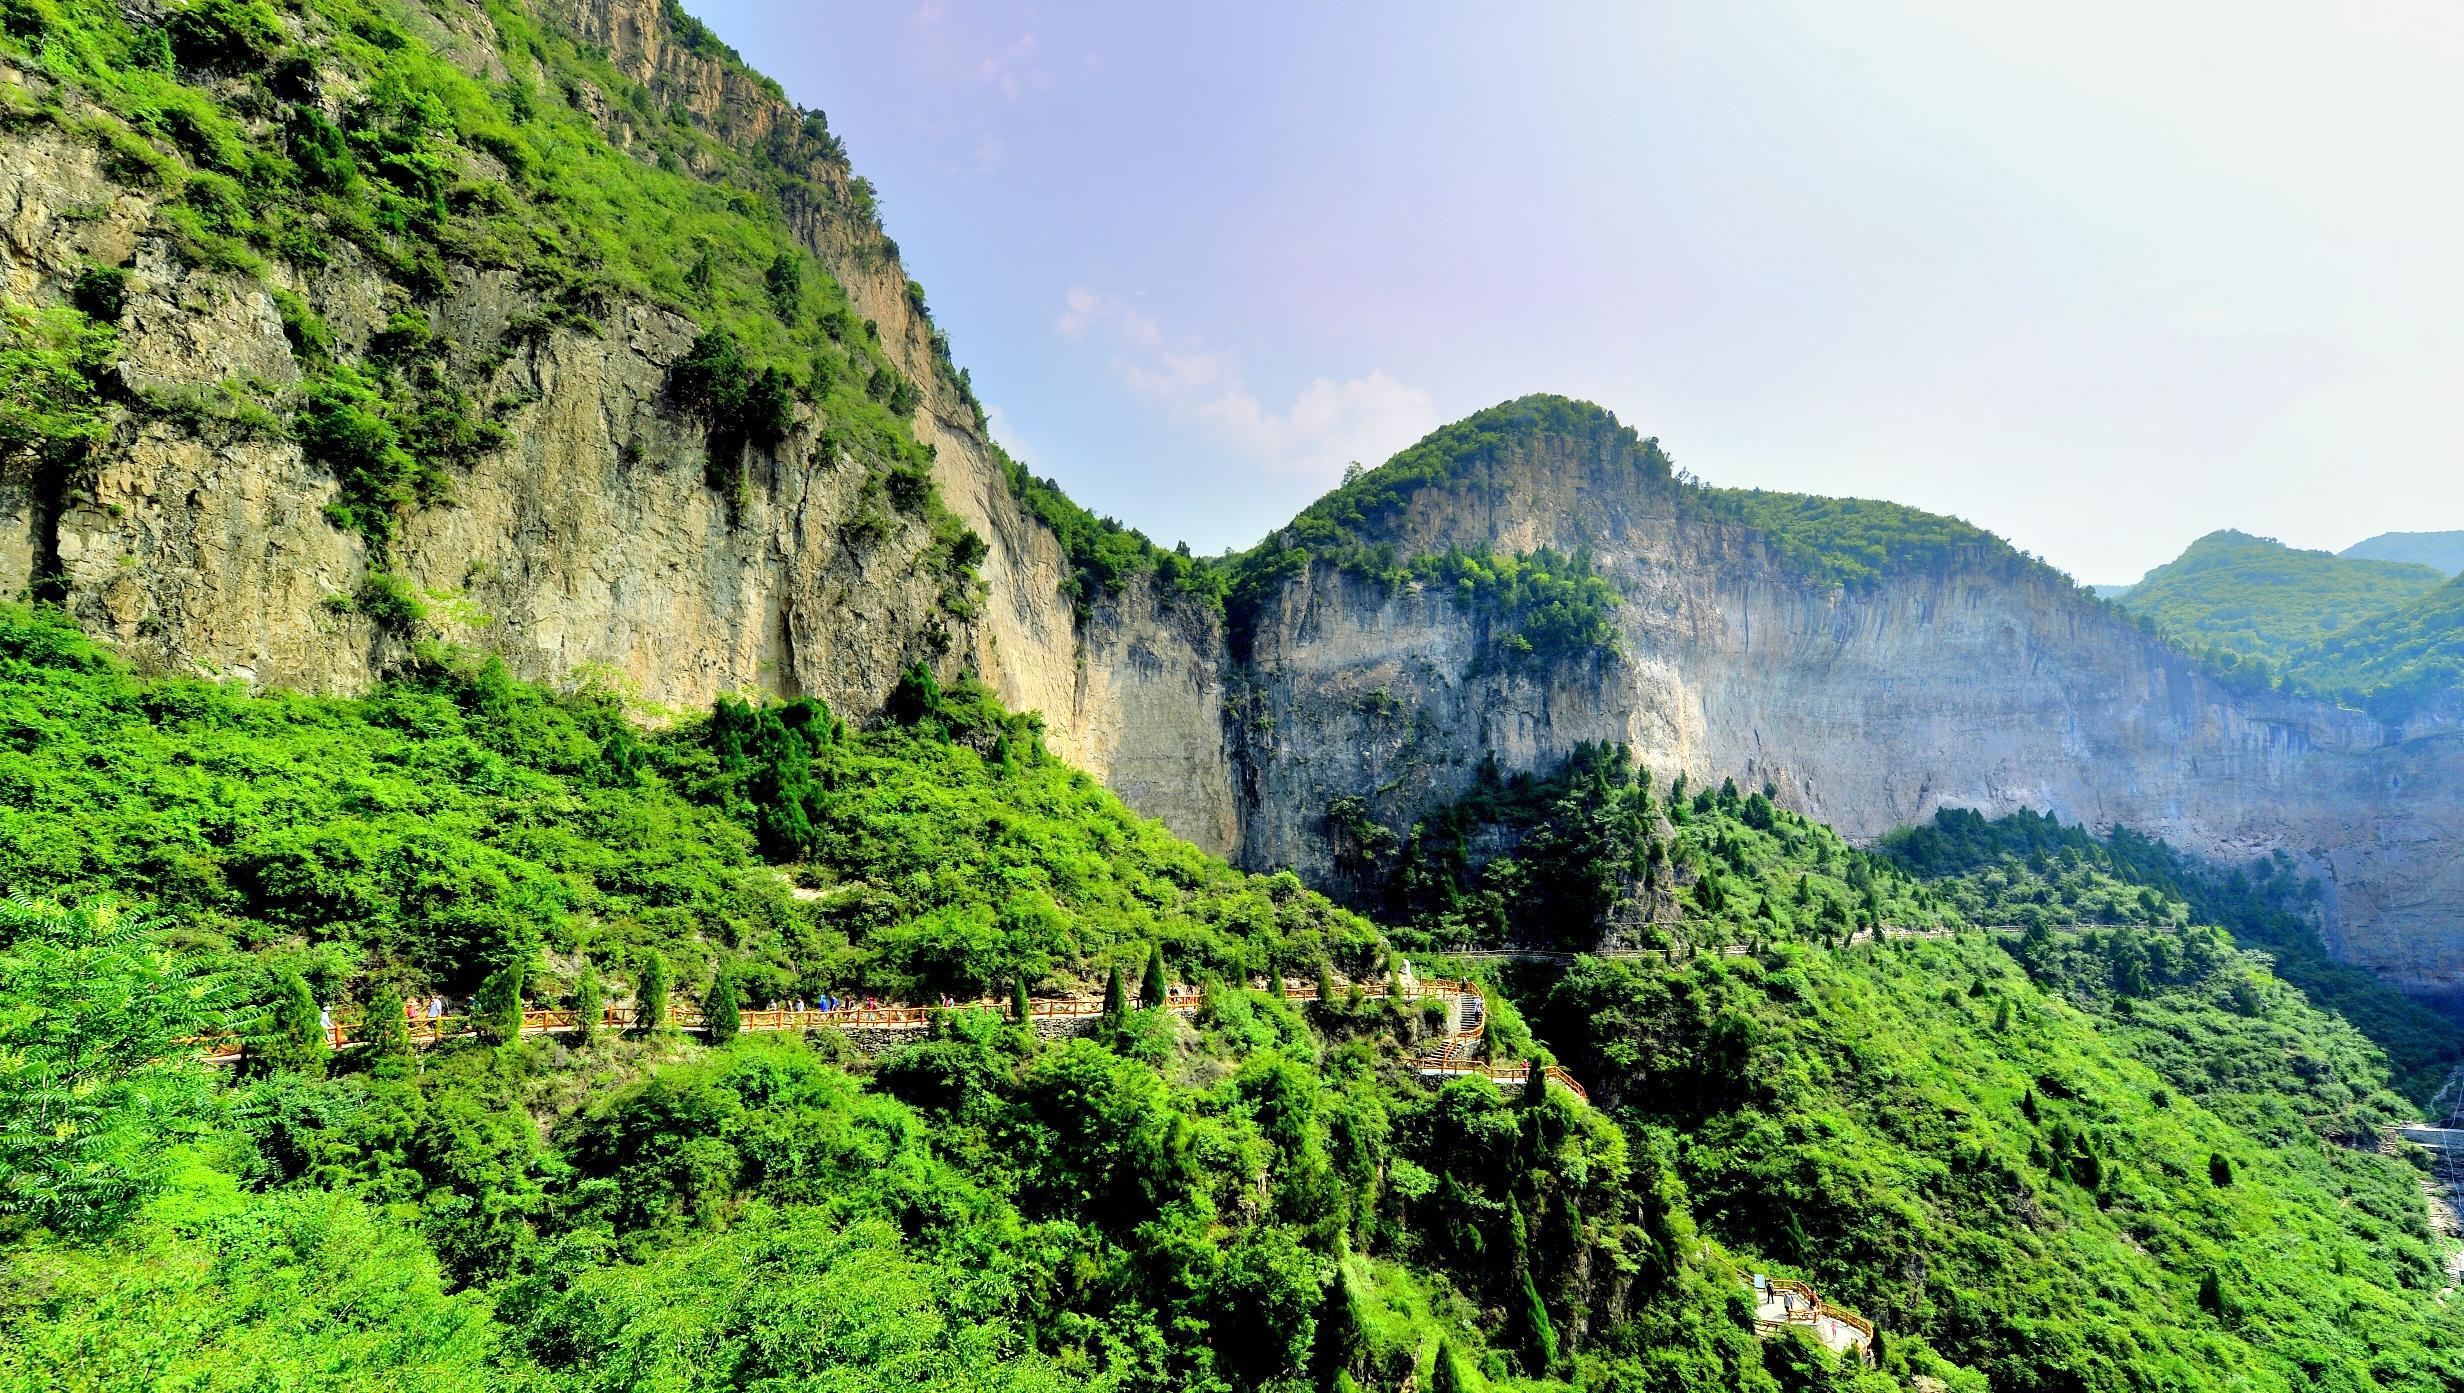 Qinglong Gorge ( Taihang Mountain Grand Canyon)